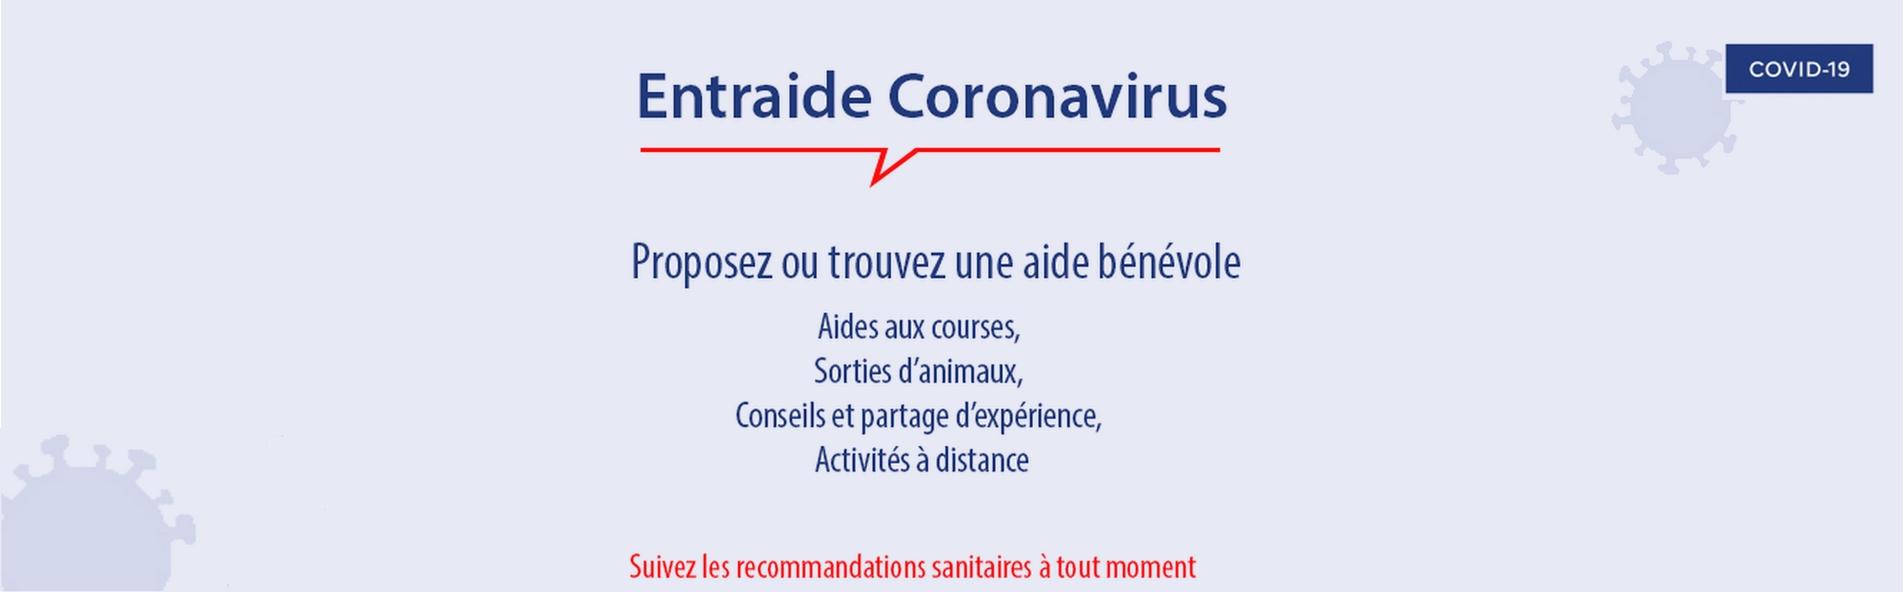 Entraide coronavirus